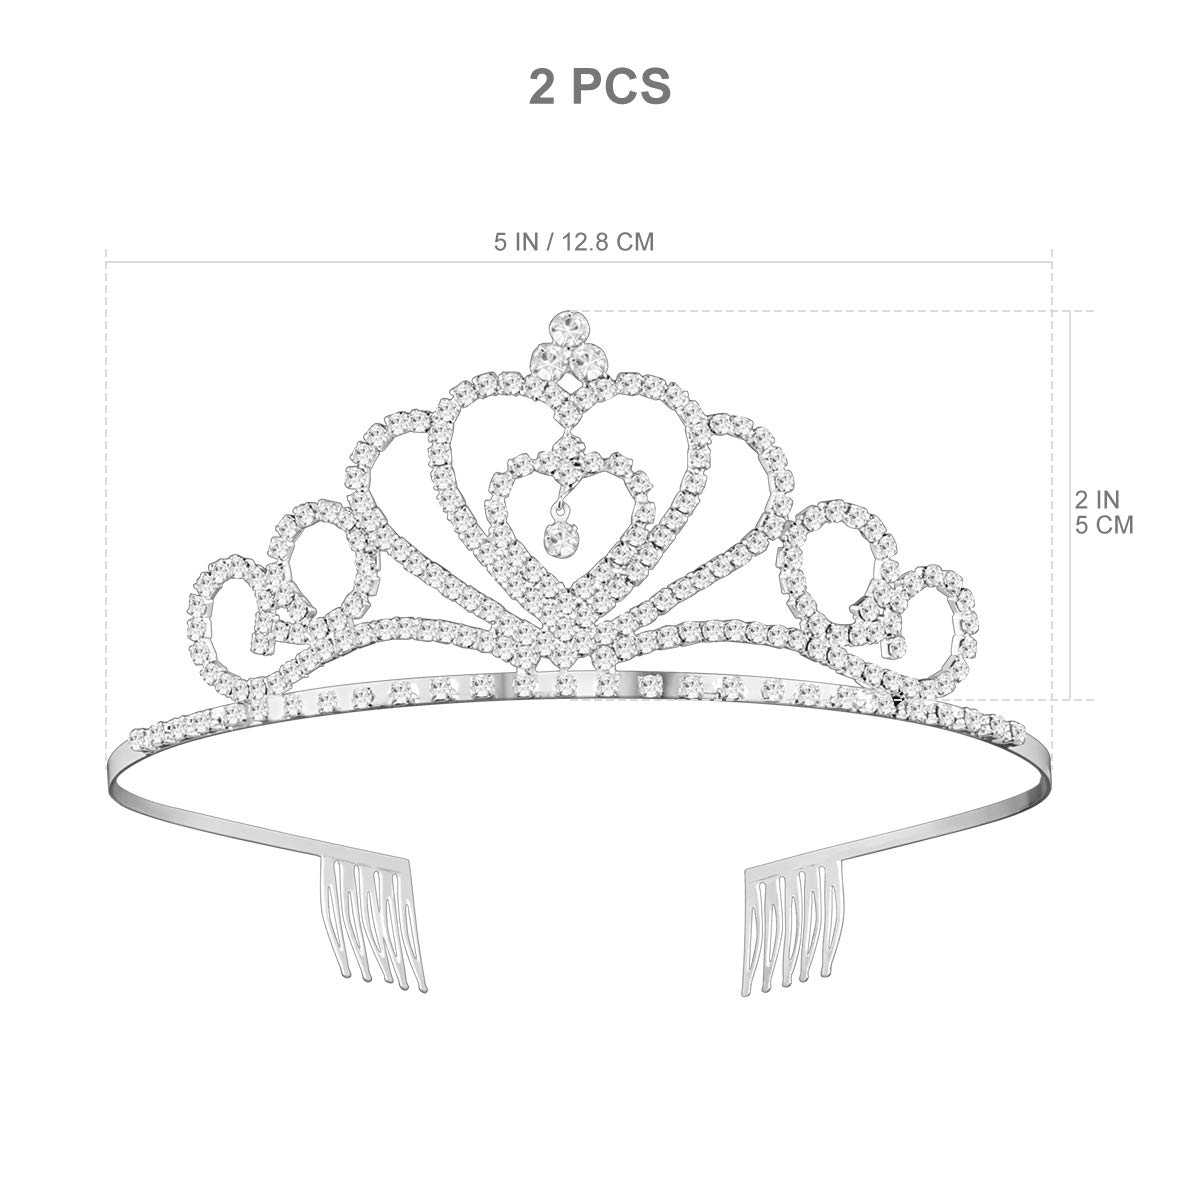 Rhinestone Crystal Tiara Crown, 2 Pack Wedding Bridal Prom Birthday Pageant Princess Tiara Headband